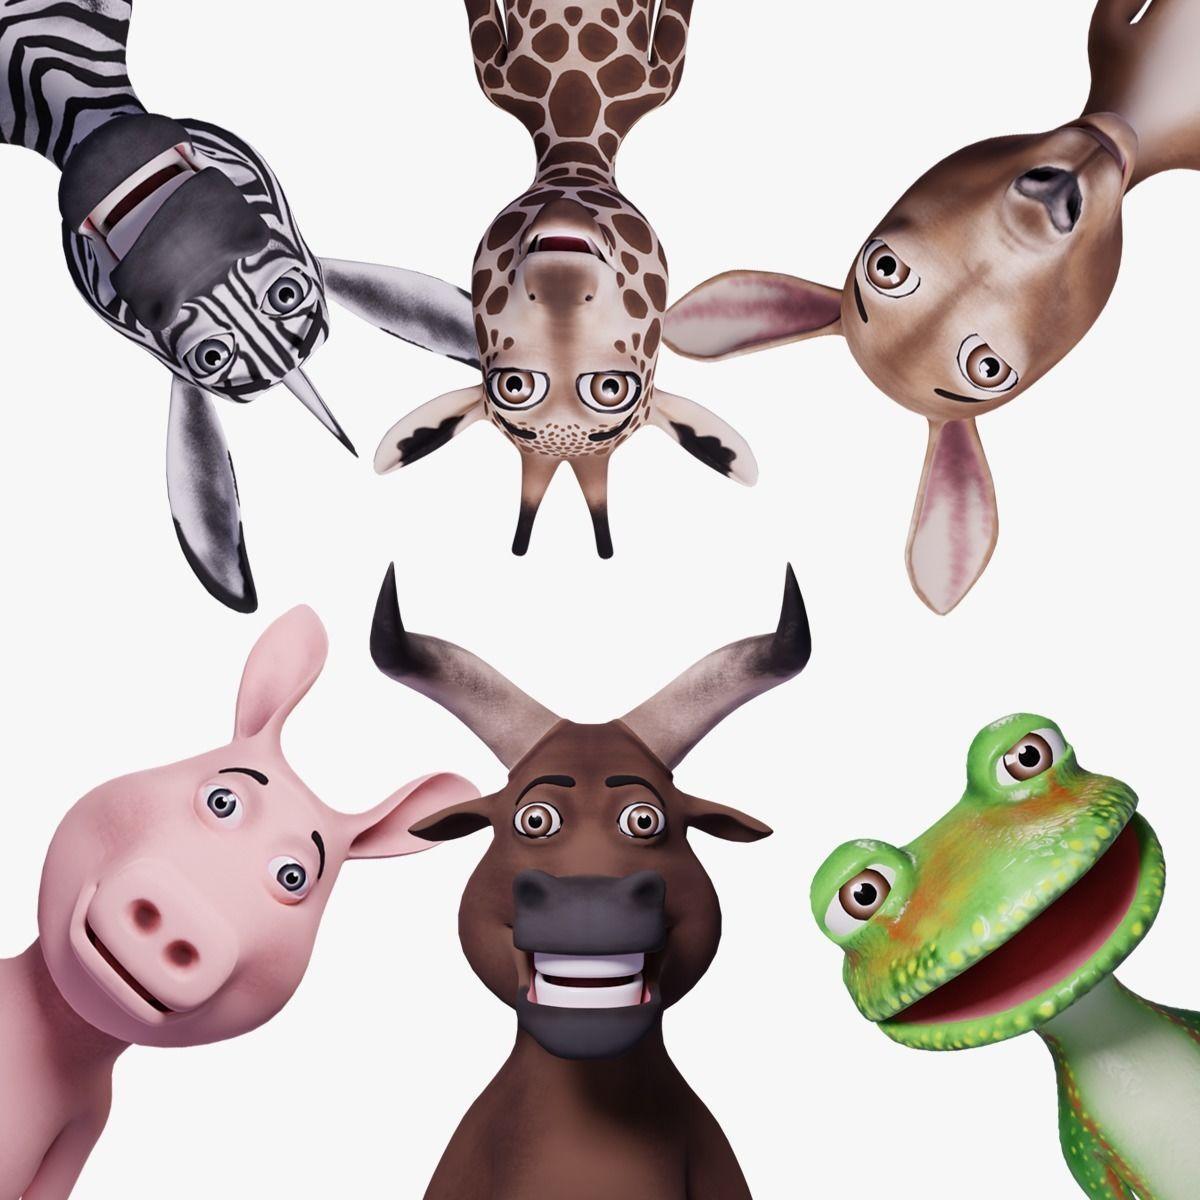 Toon Humanoid Animals Vol 2